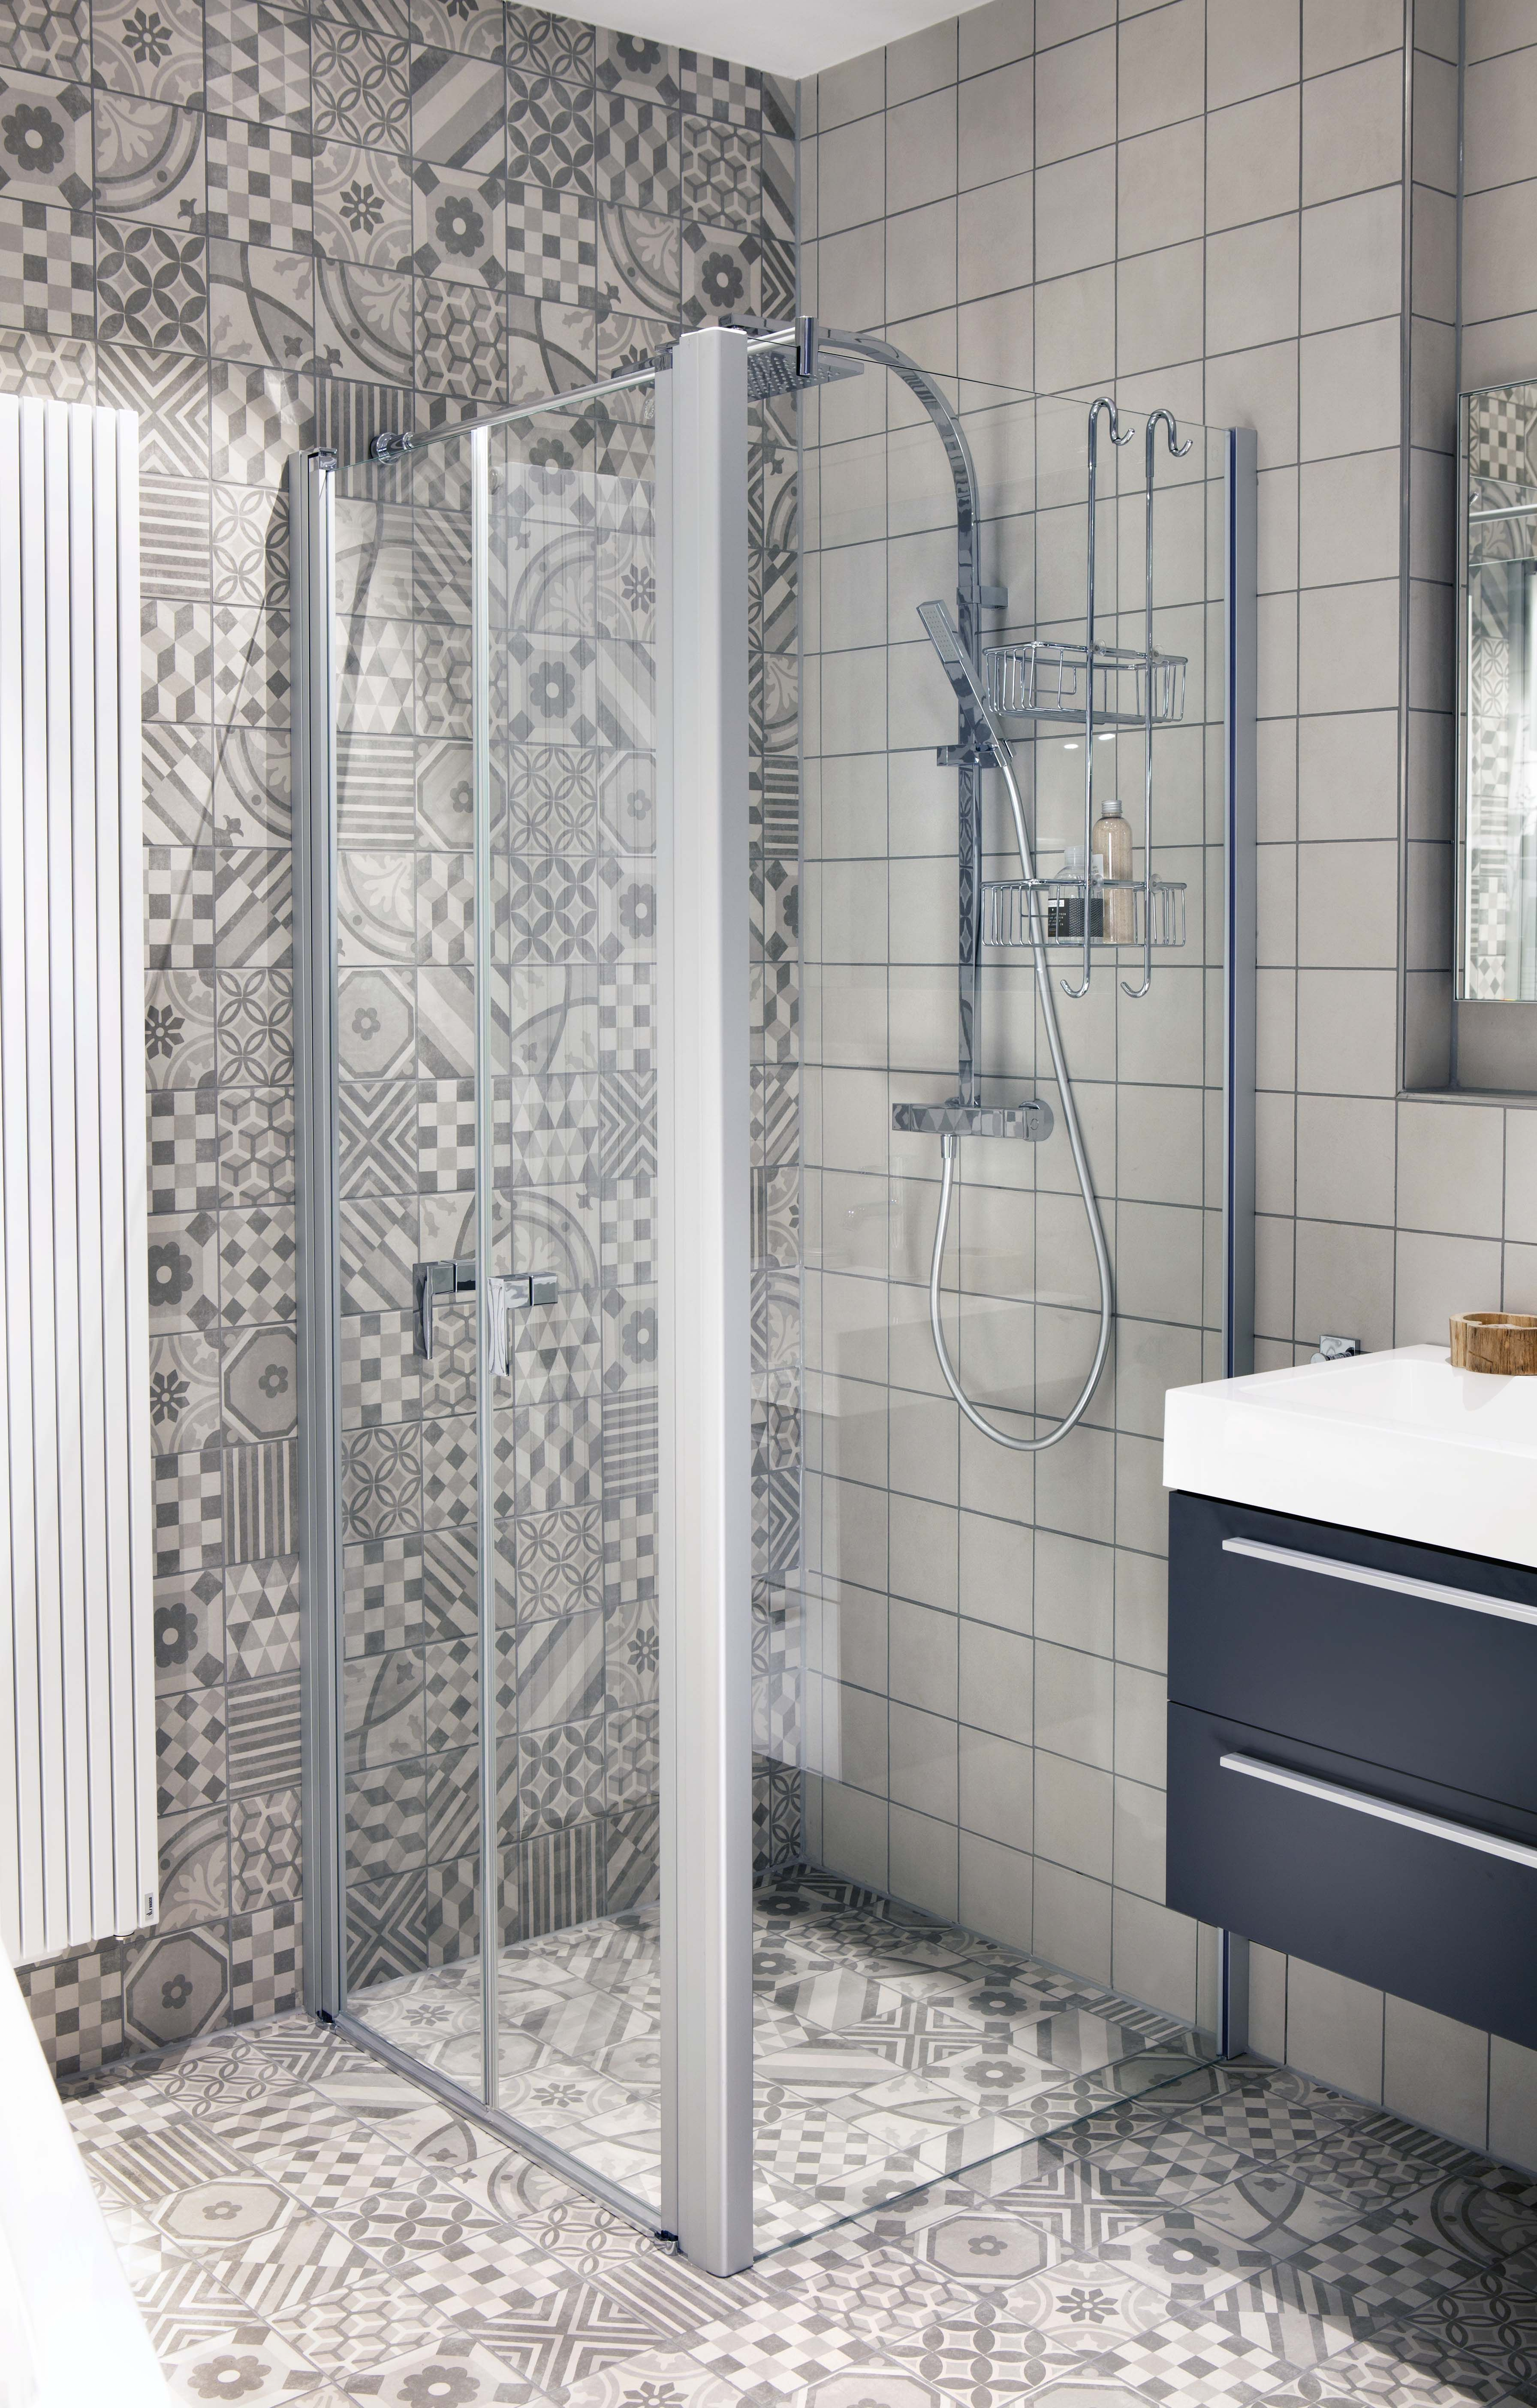 pacte douche met glazen wand kleine badkamer pinterest